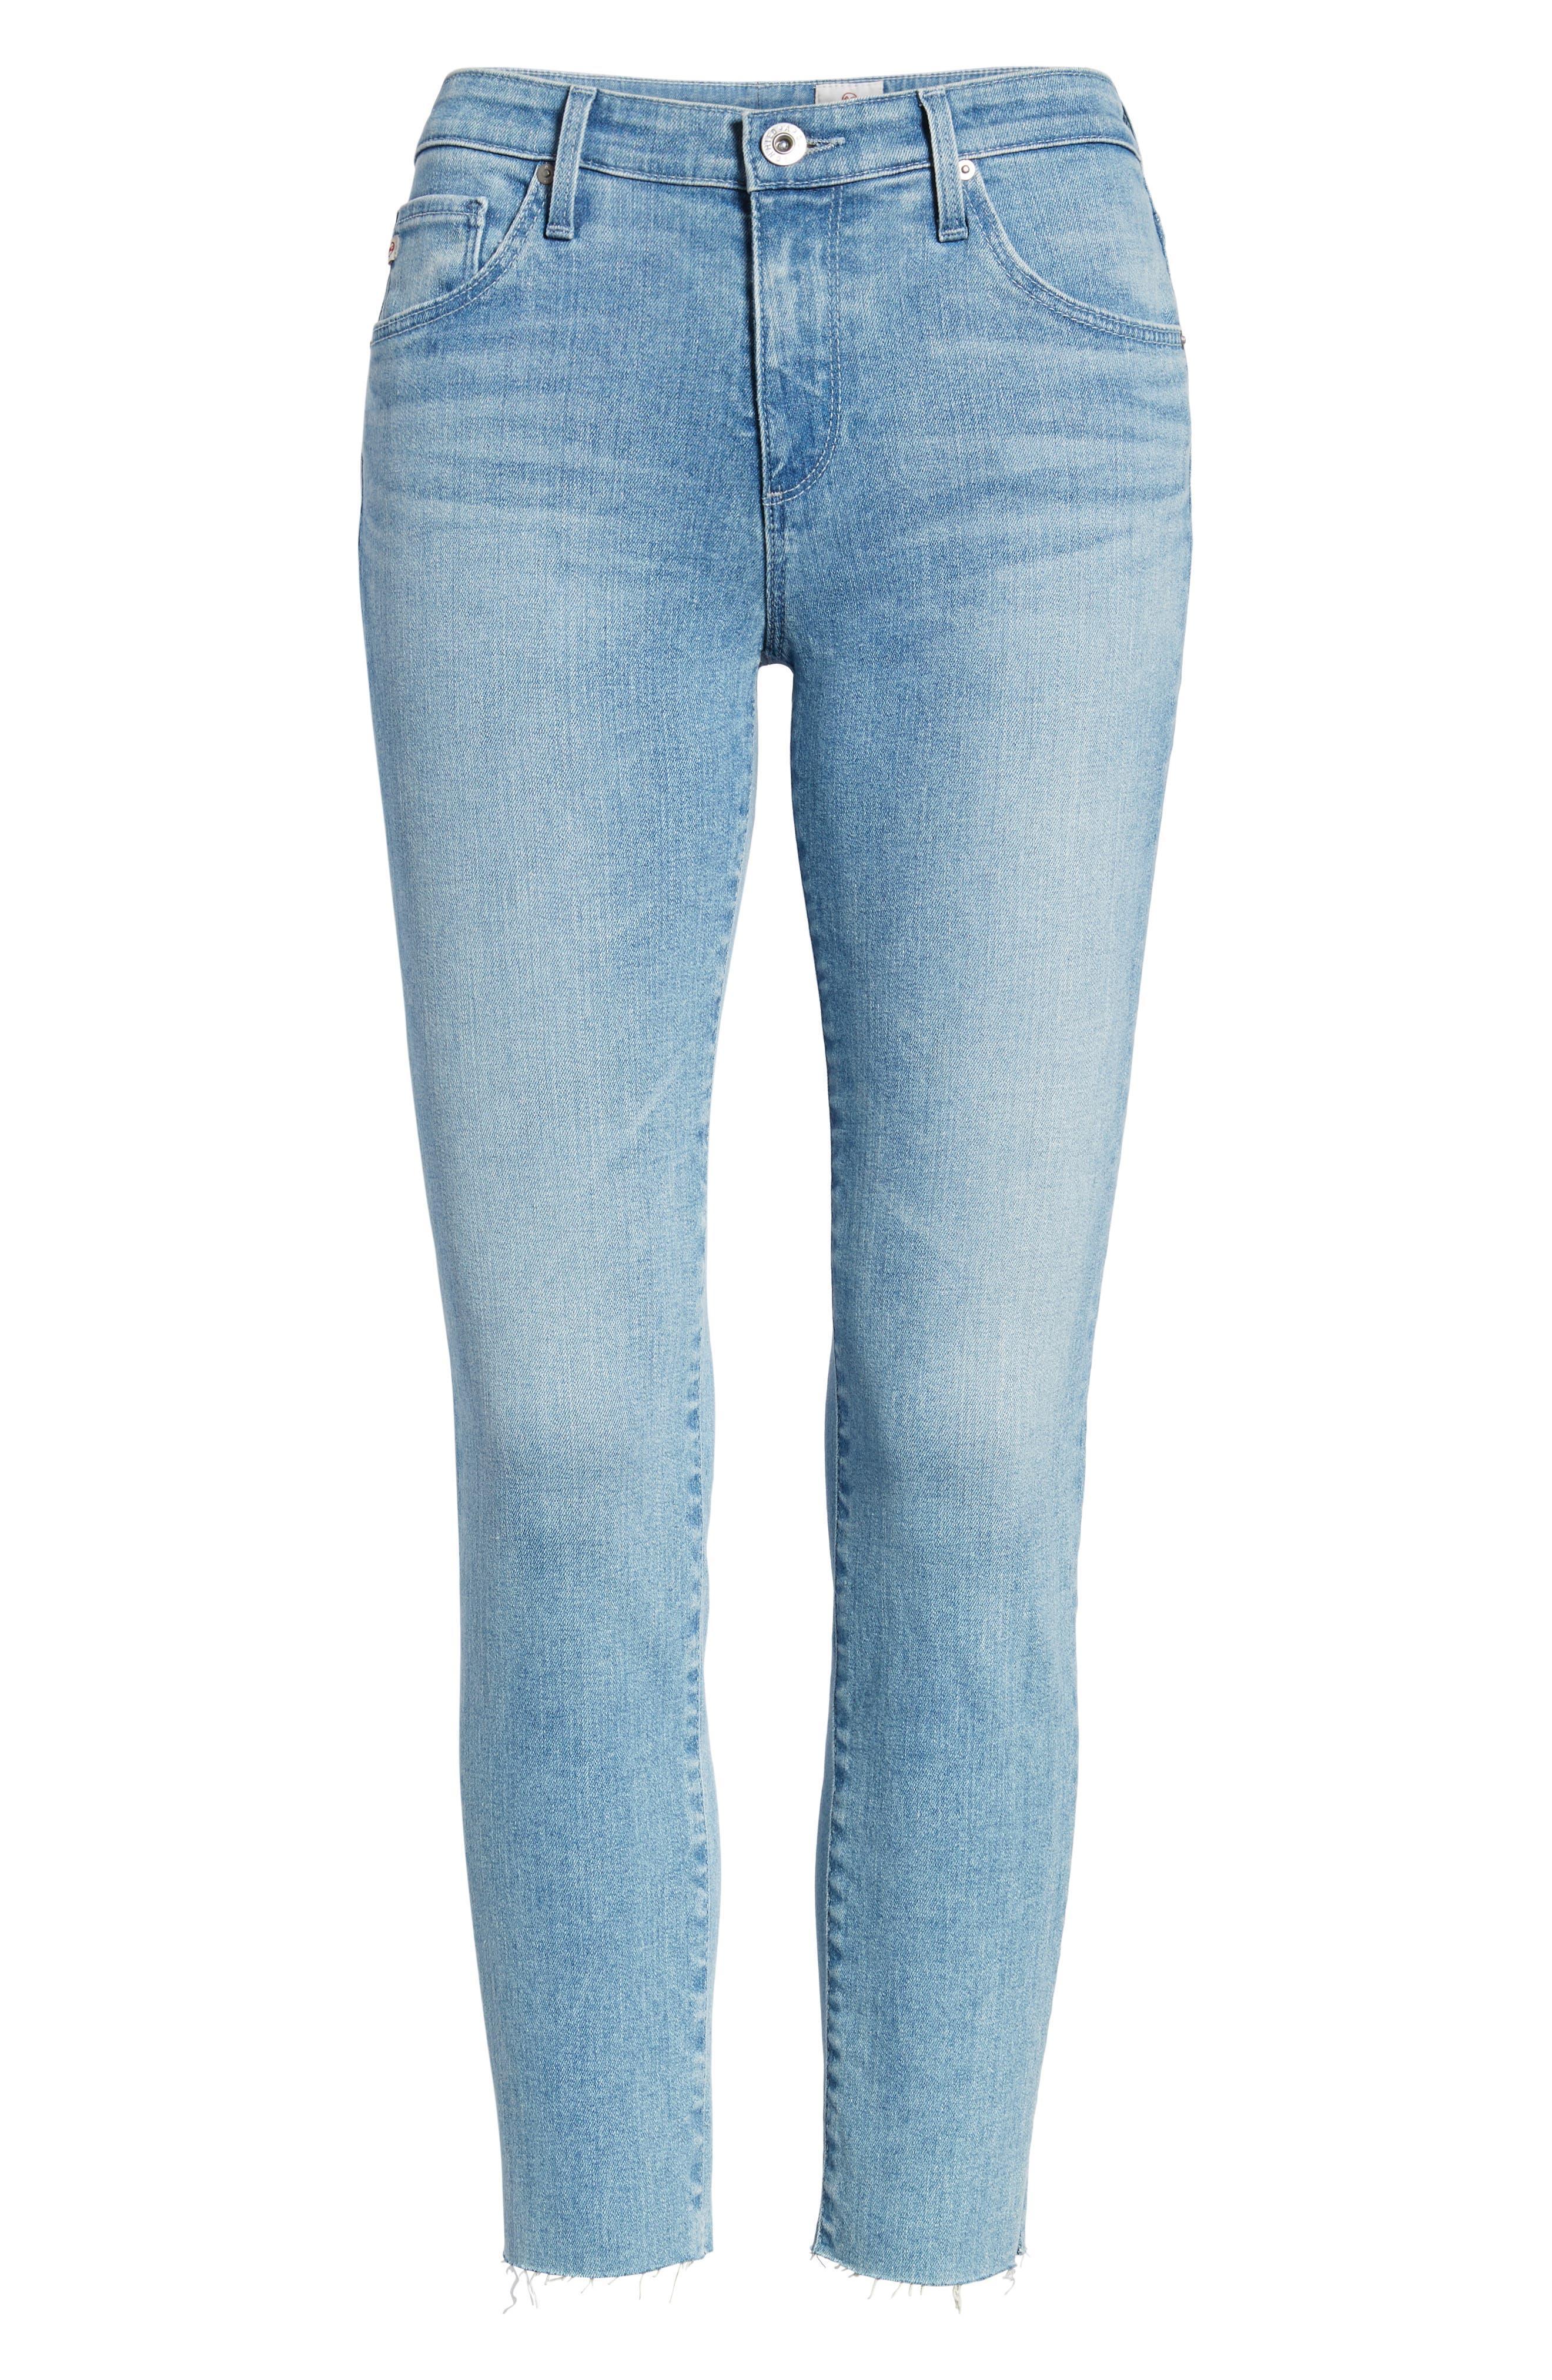 Prima Crop Skinny Jeans,                             Alternate thumbnail 7, color,                             SINGULARITY